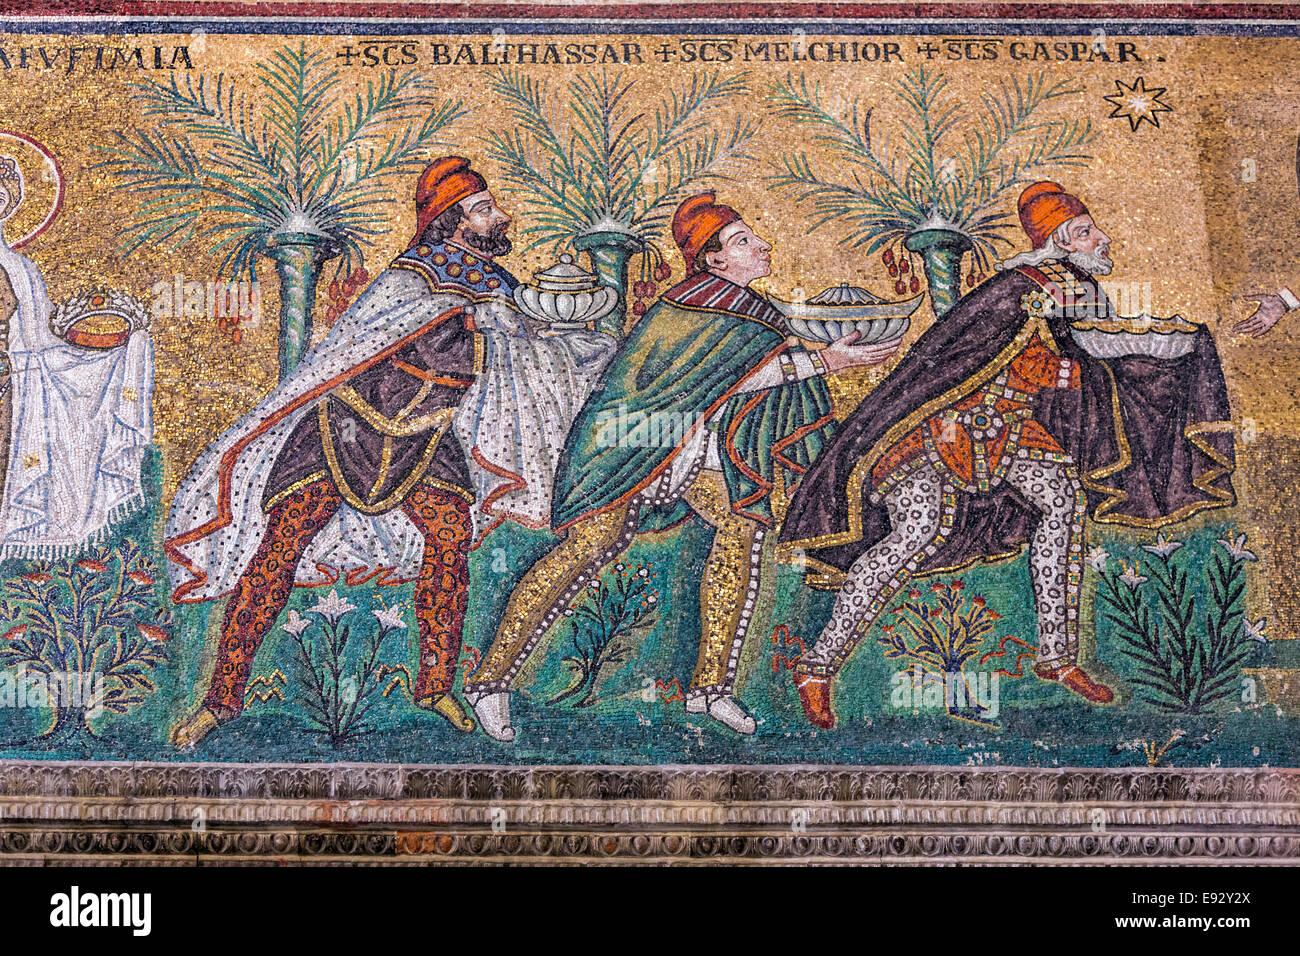 detail-of-byzantine-mosaic-in-santapolli